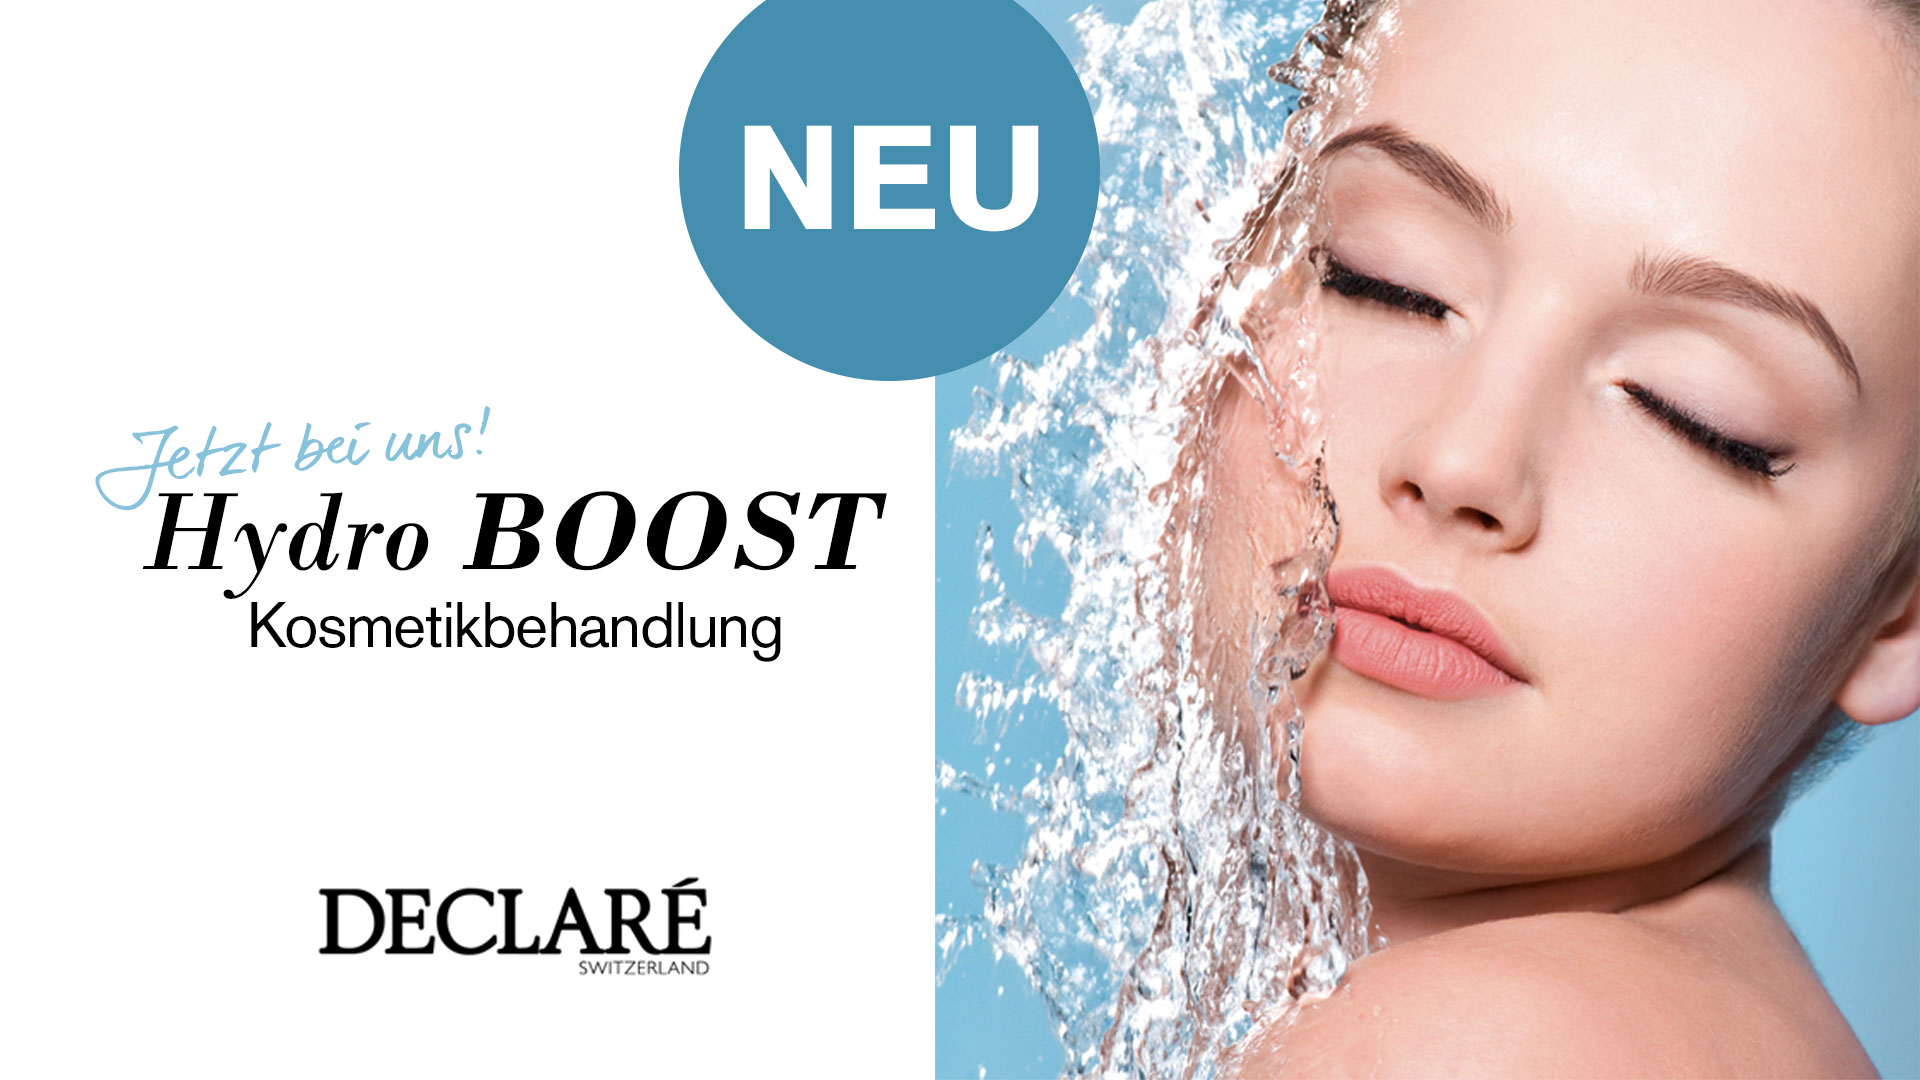 declare-trendbehandlung-hydro-boost-in-den-schuback-kosmetik-lounges